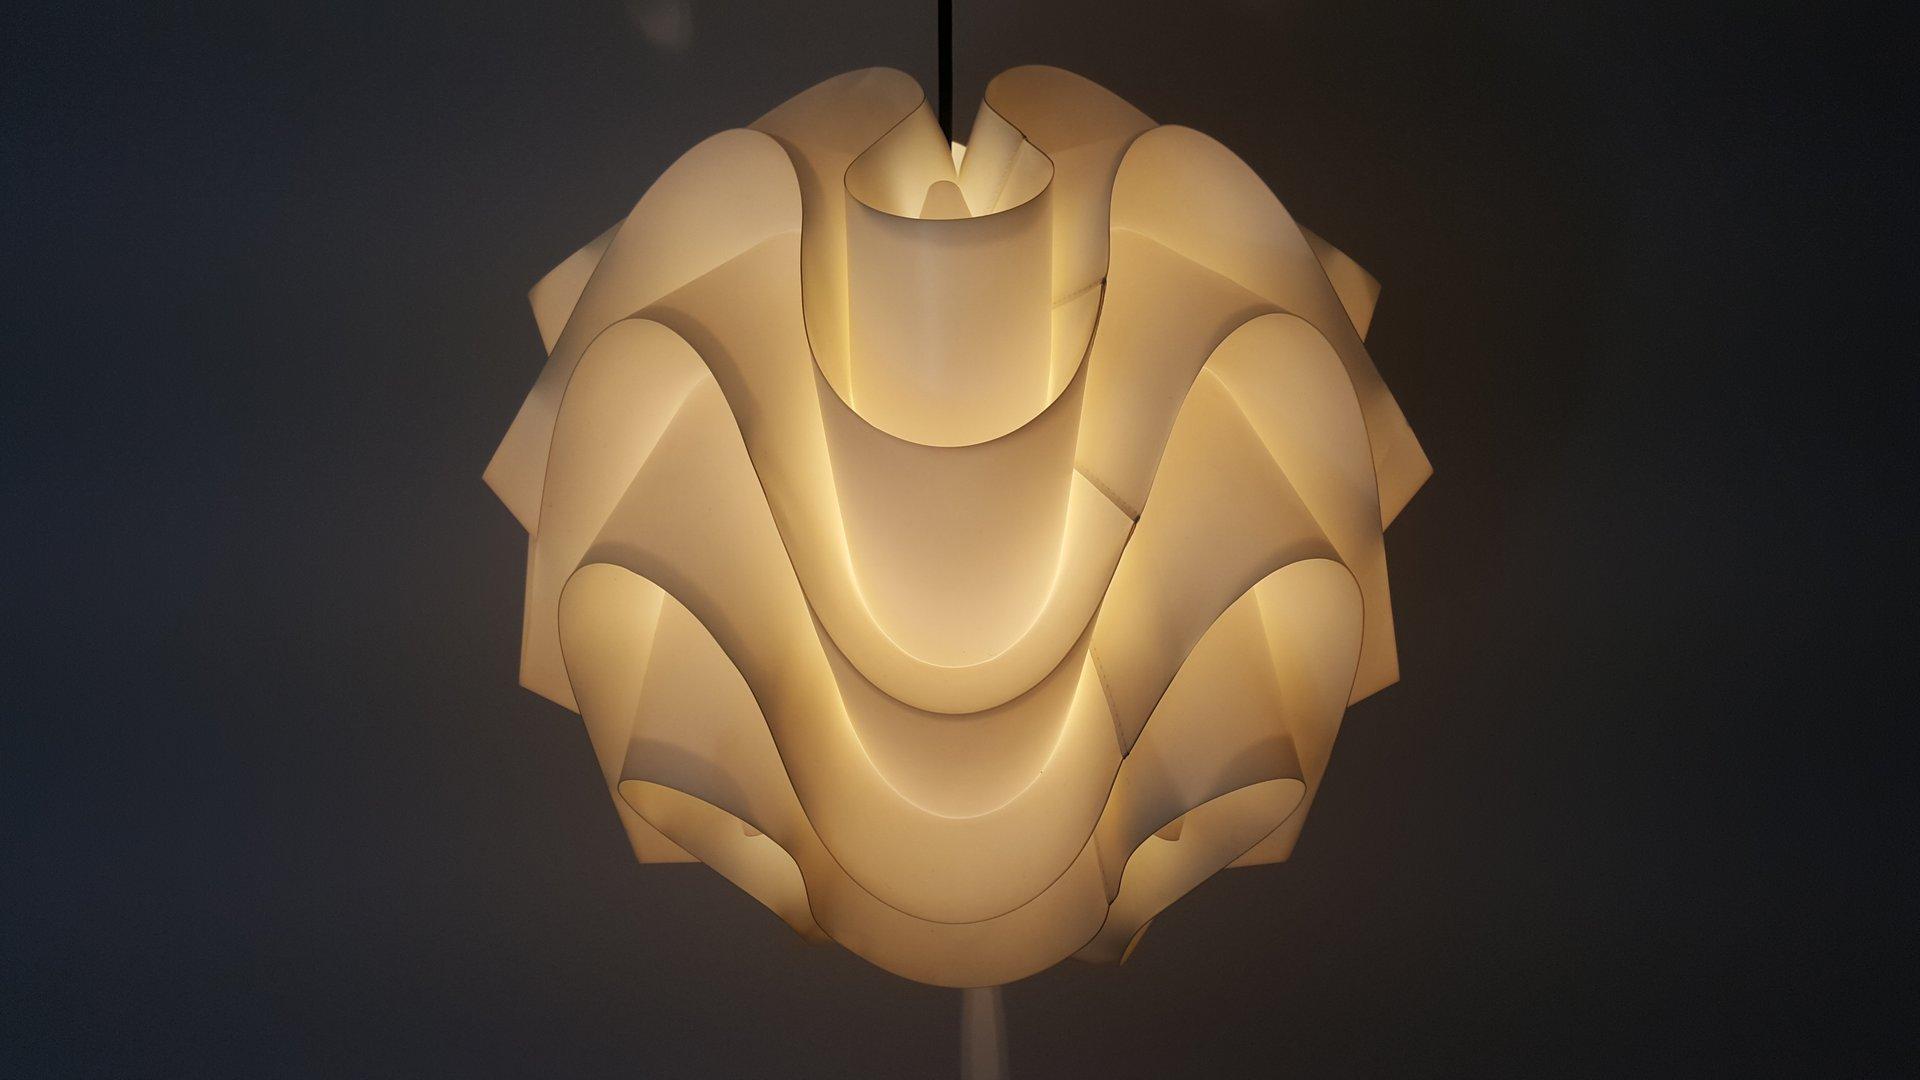 klint lighting.  klint vintage model 172 pendant by poul christiansen for le klint inside lighting e